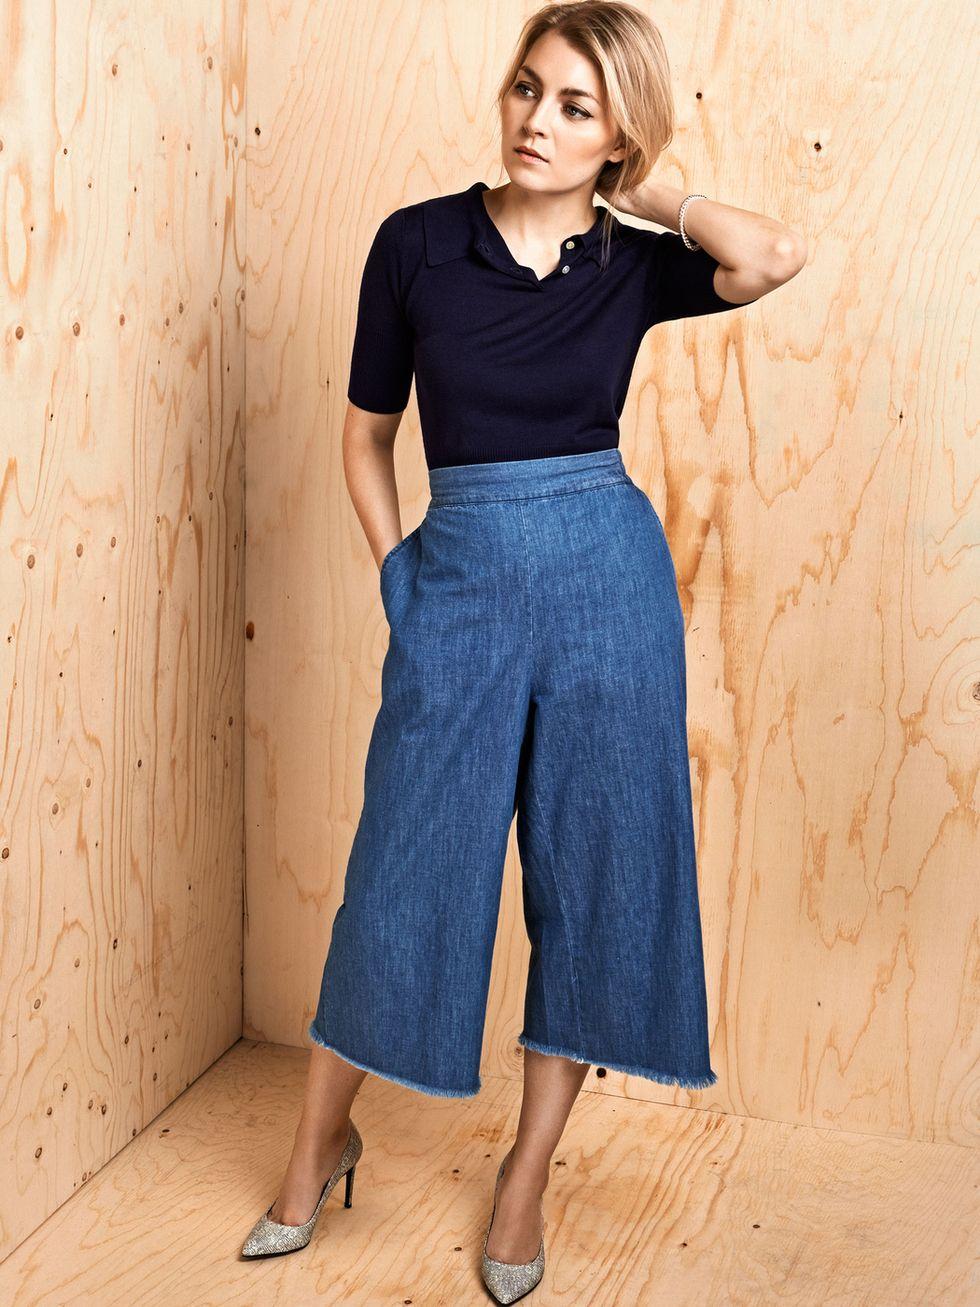 Kevään lempihousut: culottes   Trendi kesäkuu 2015, how to wear culottes - Pupulandia   Lily.fi